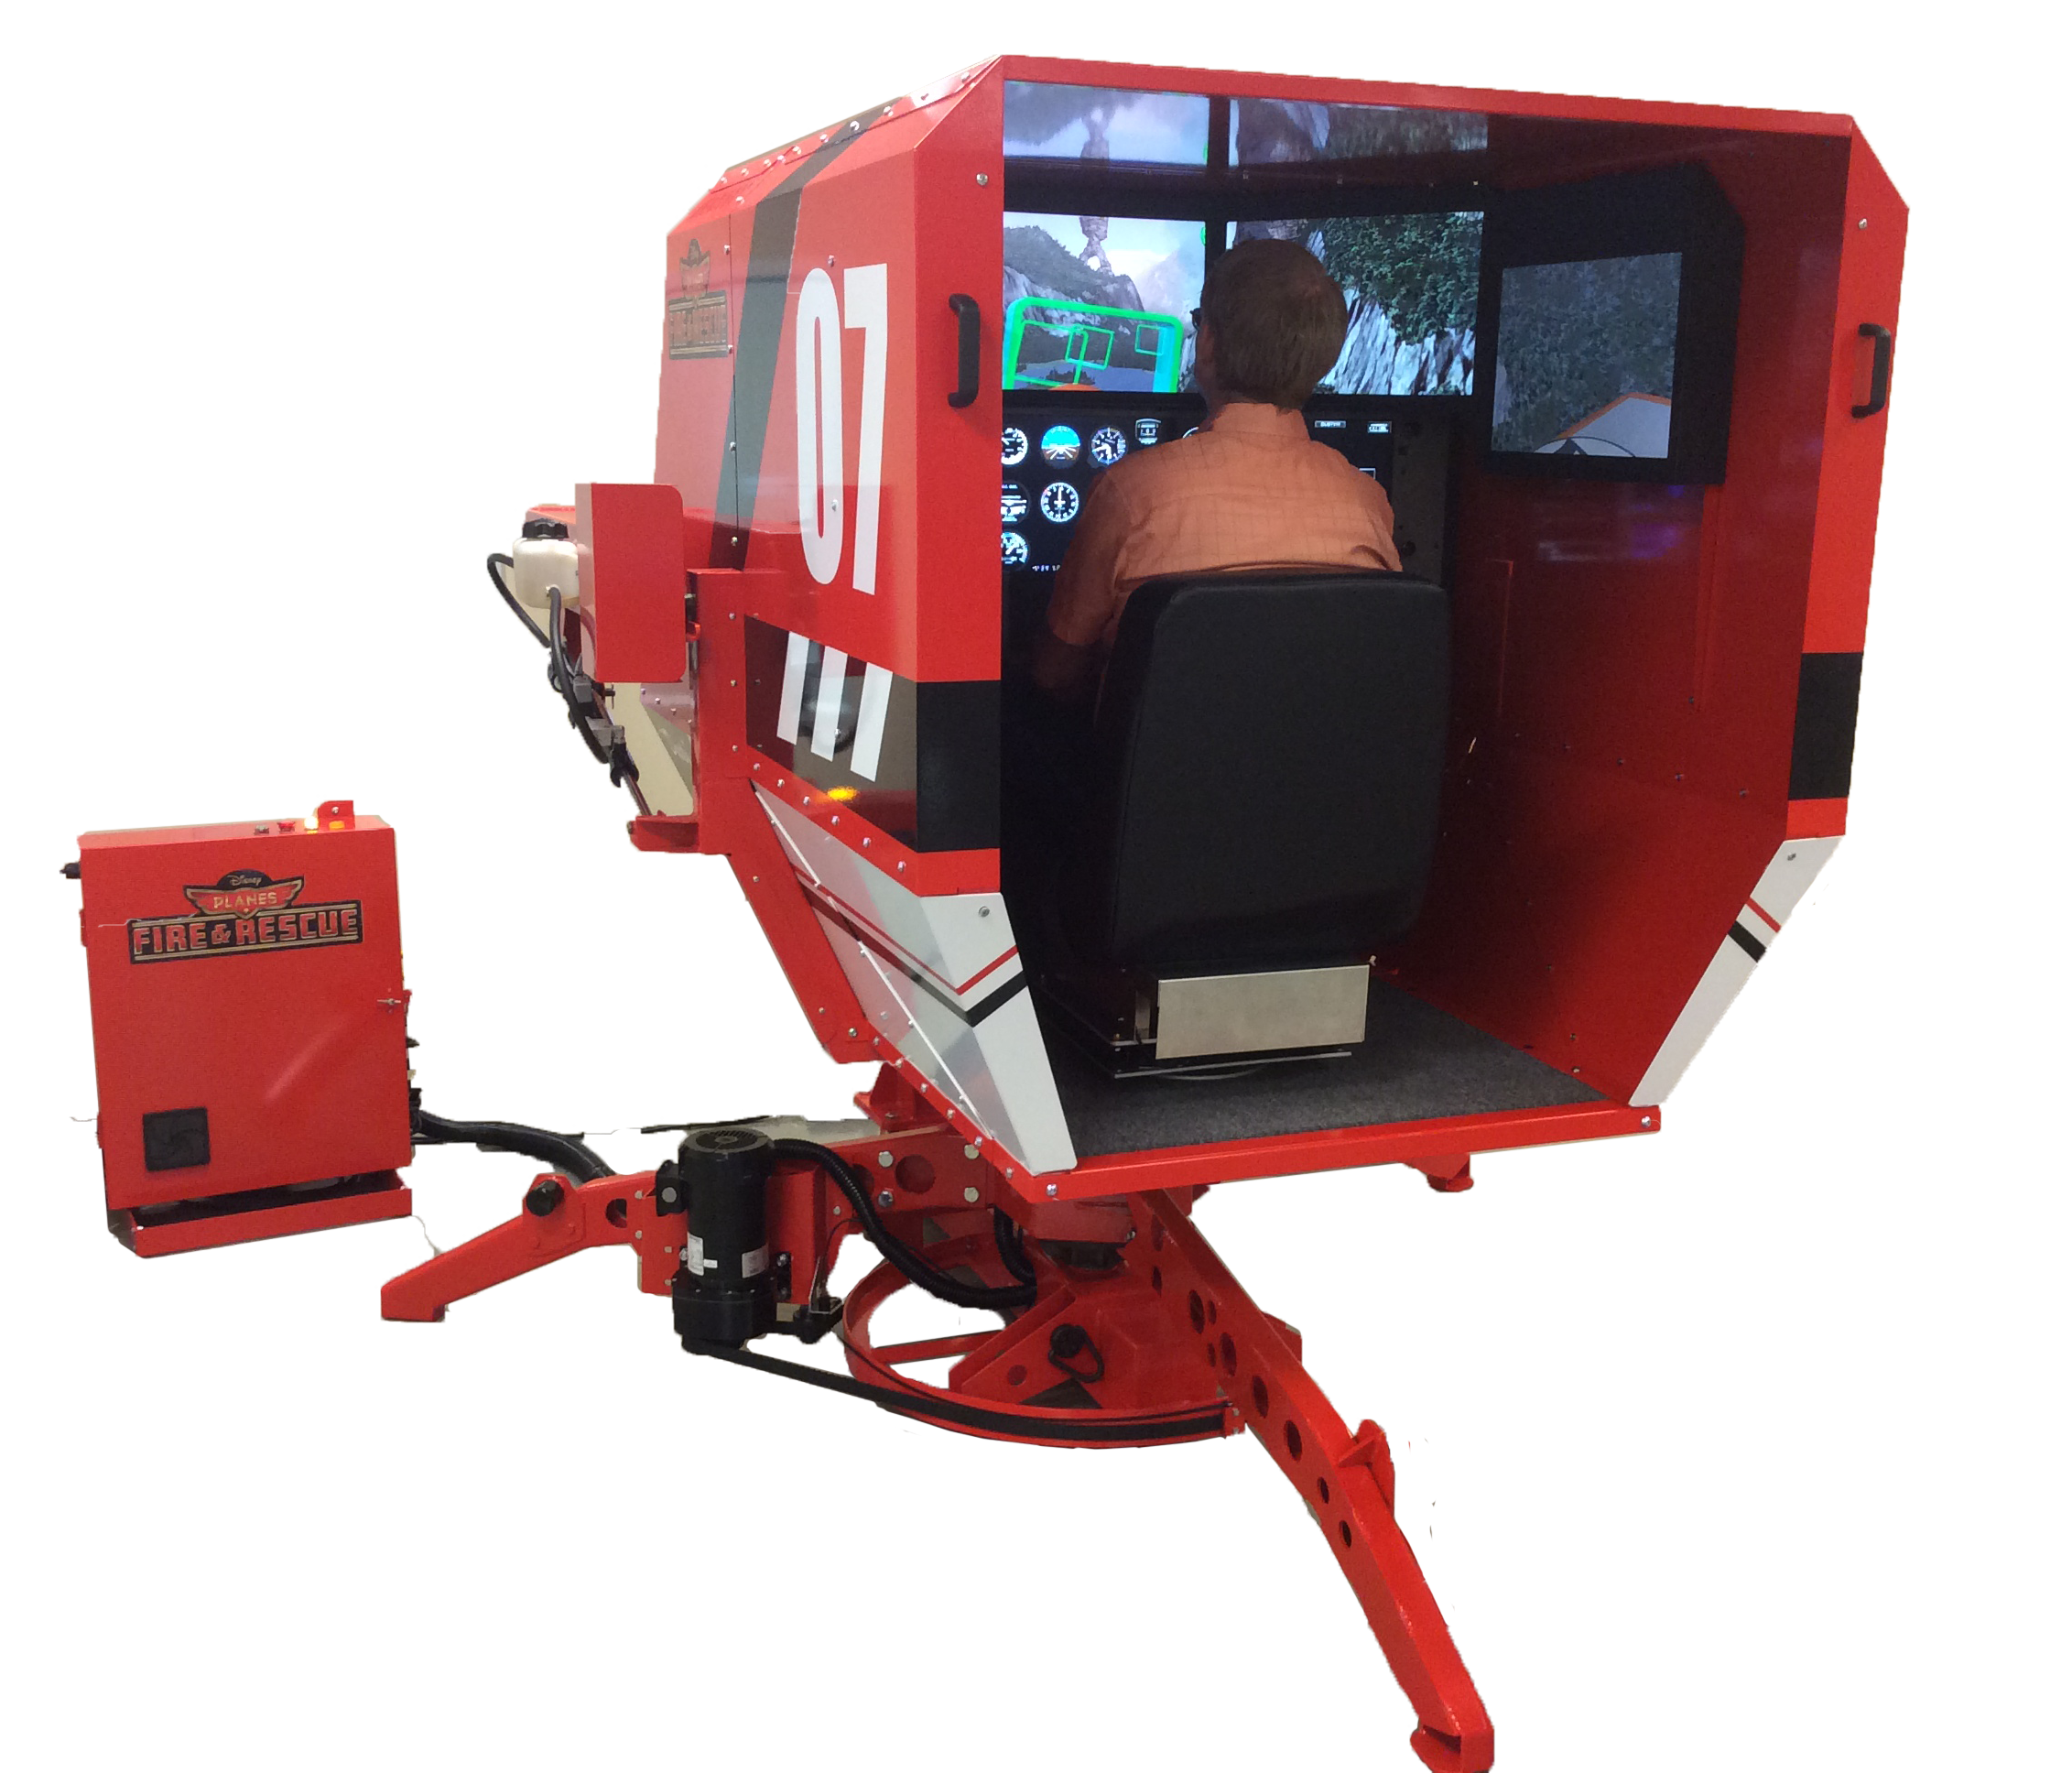 Redbird Dusty Simulator Planes: Fire & Rescue